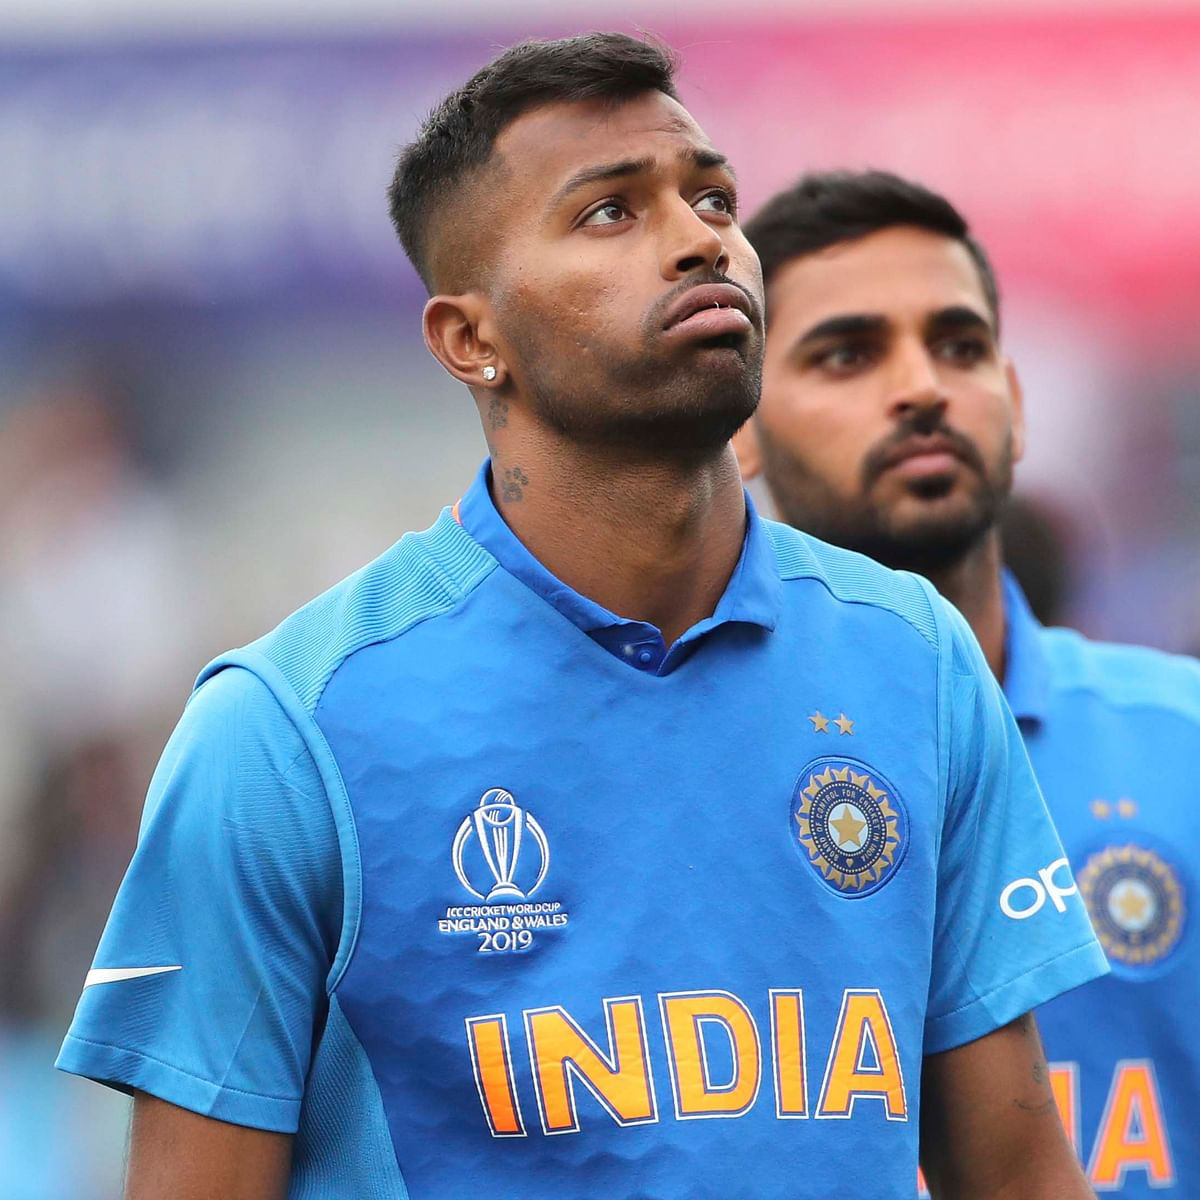 Vijay Shankar replaces Hardik Pandya in India A squad after failed fitness test